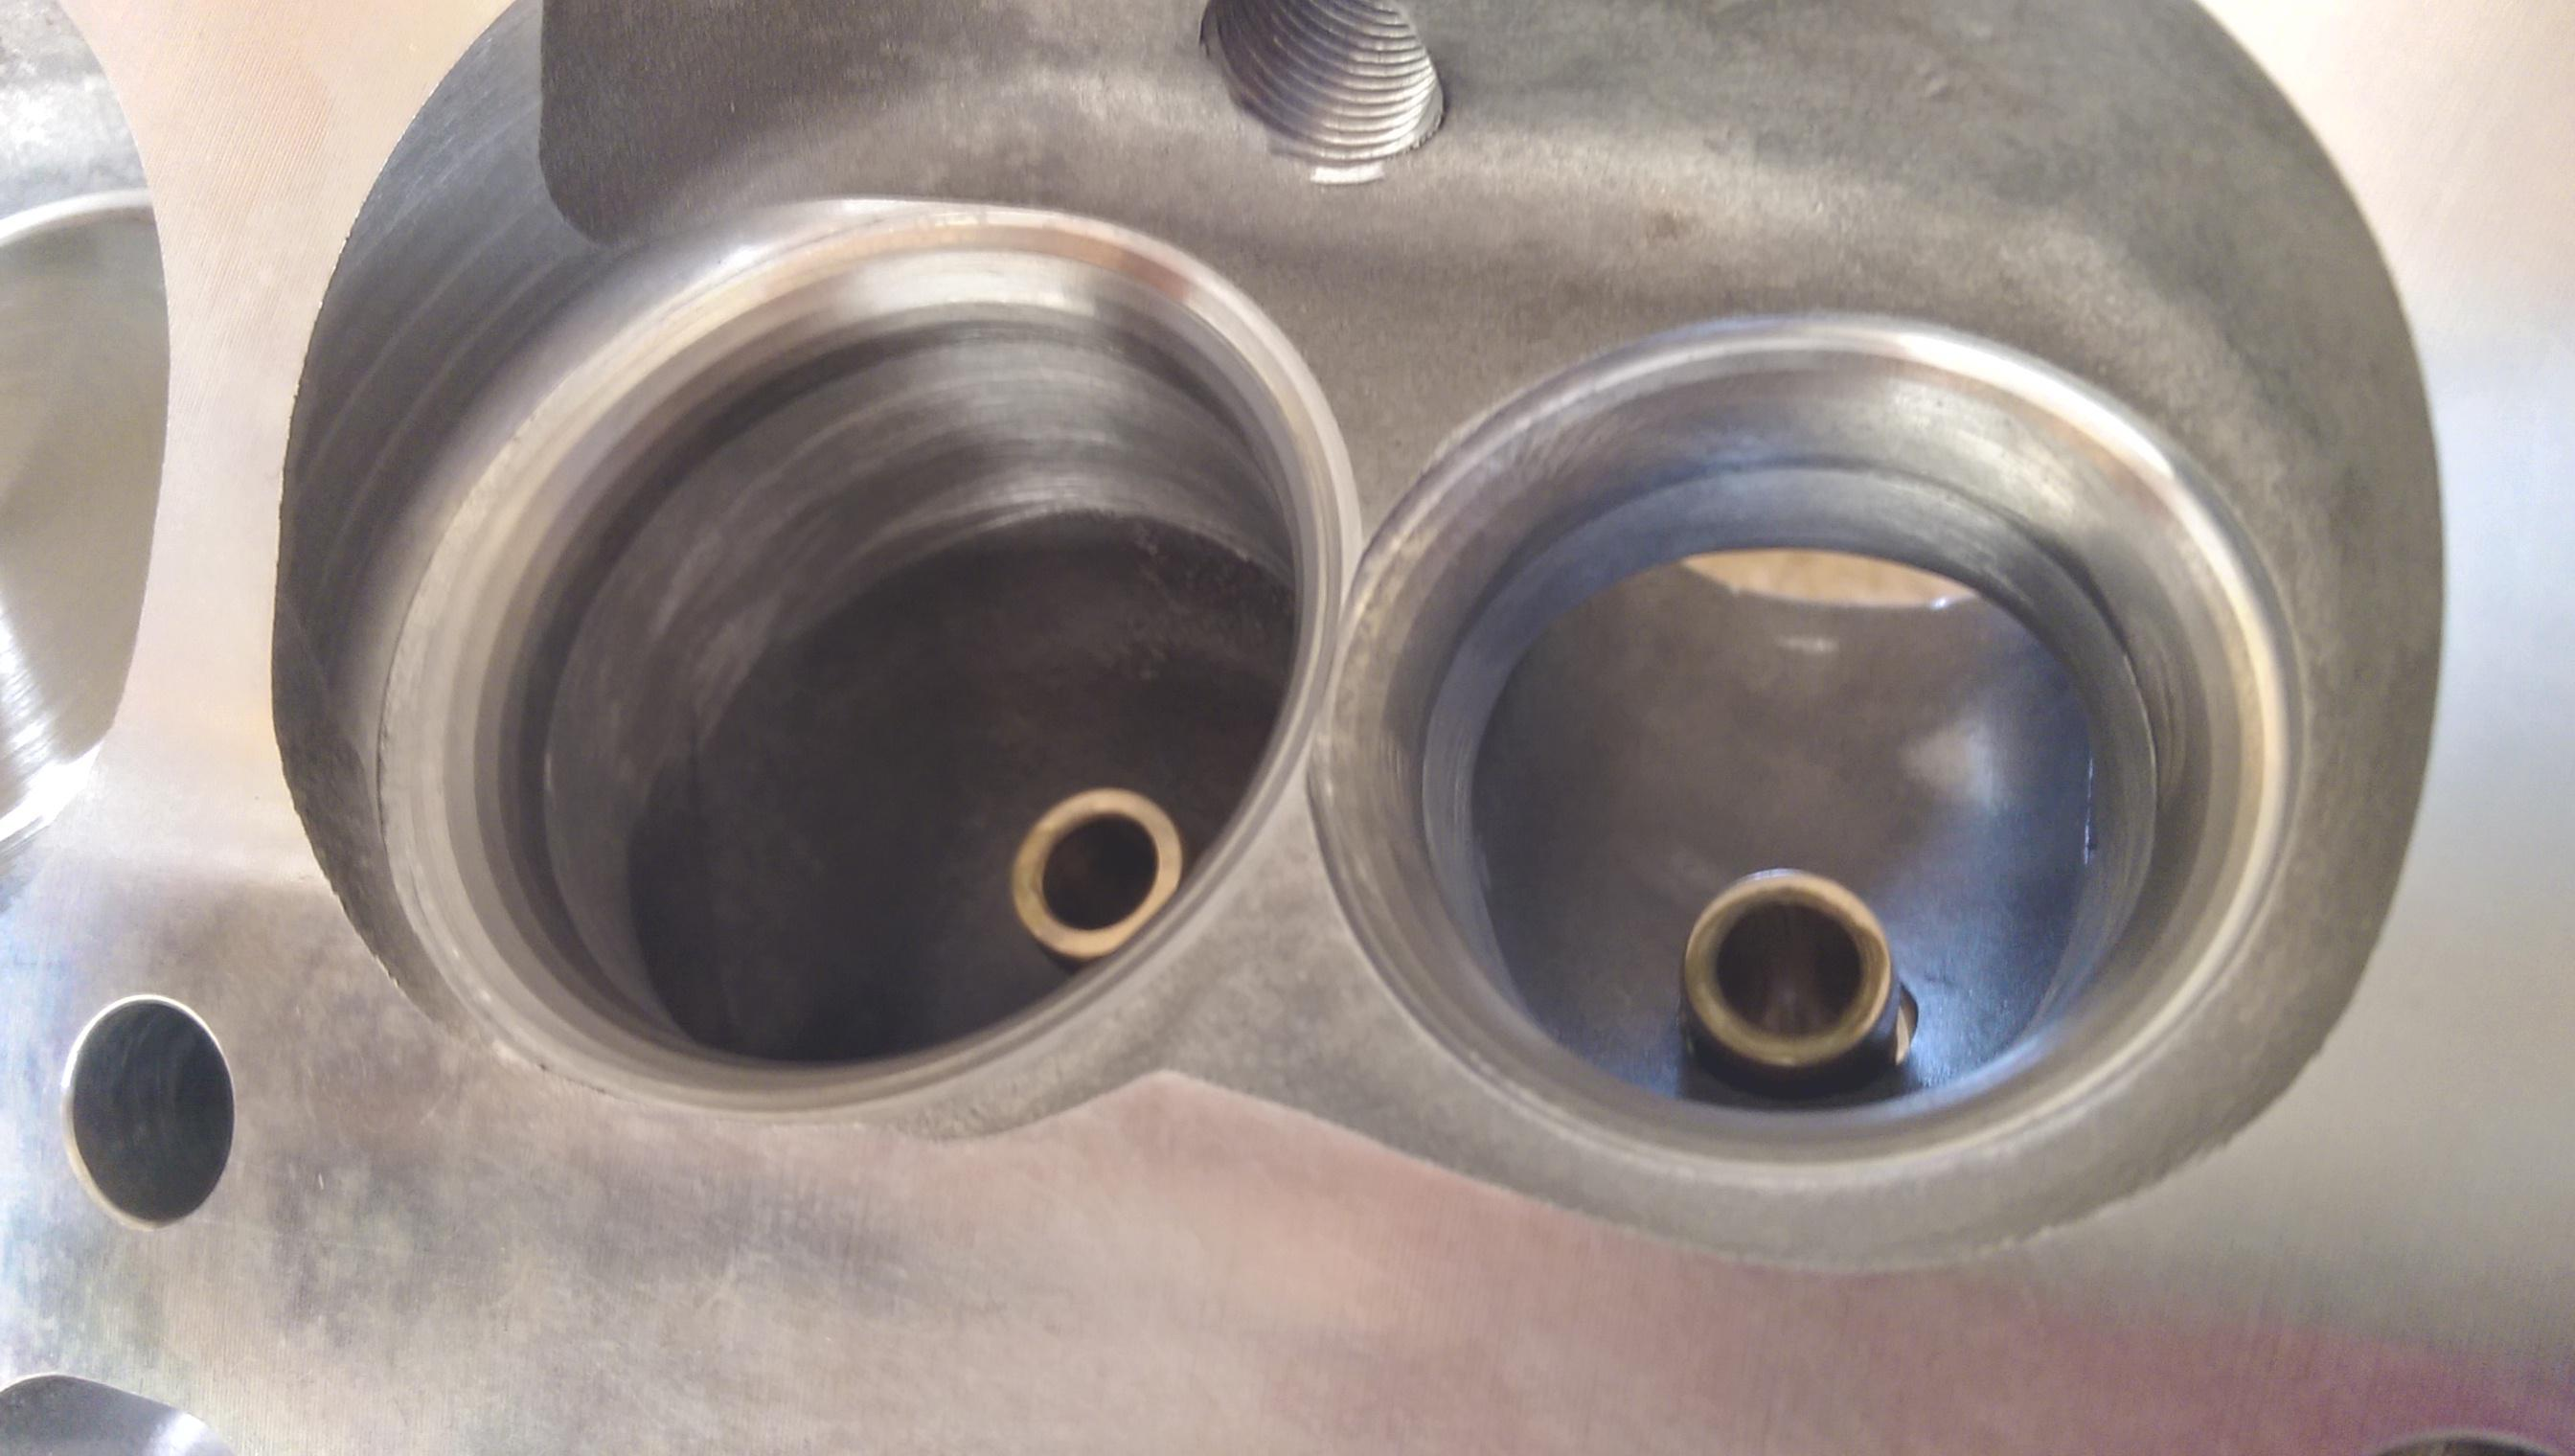 My ProMaxx Maxx 200cc sbc heads arrived - Hot Rod Forum